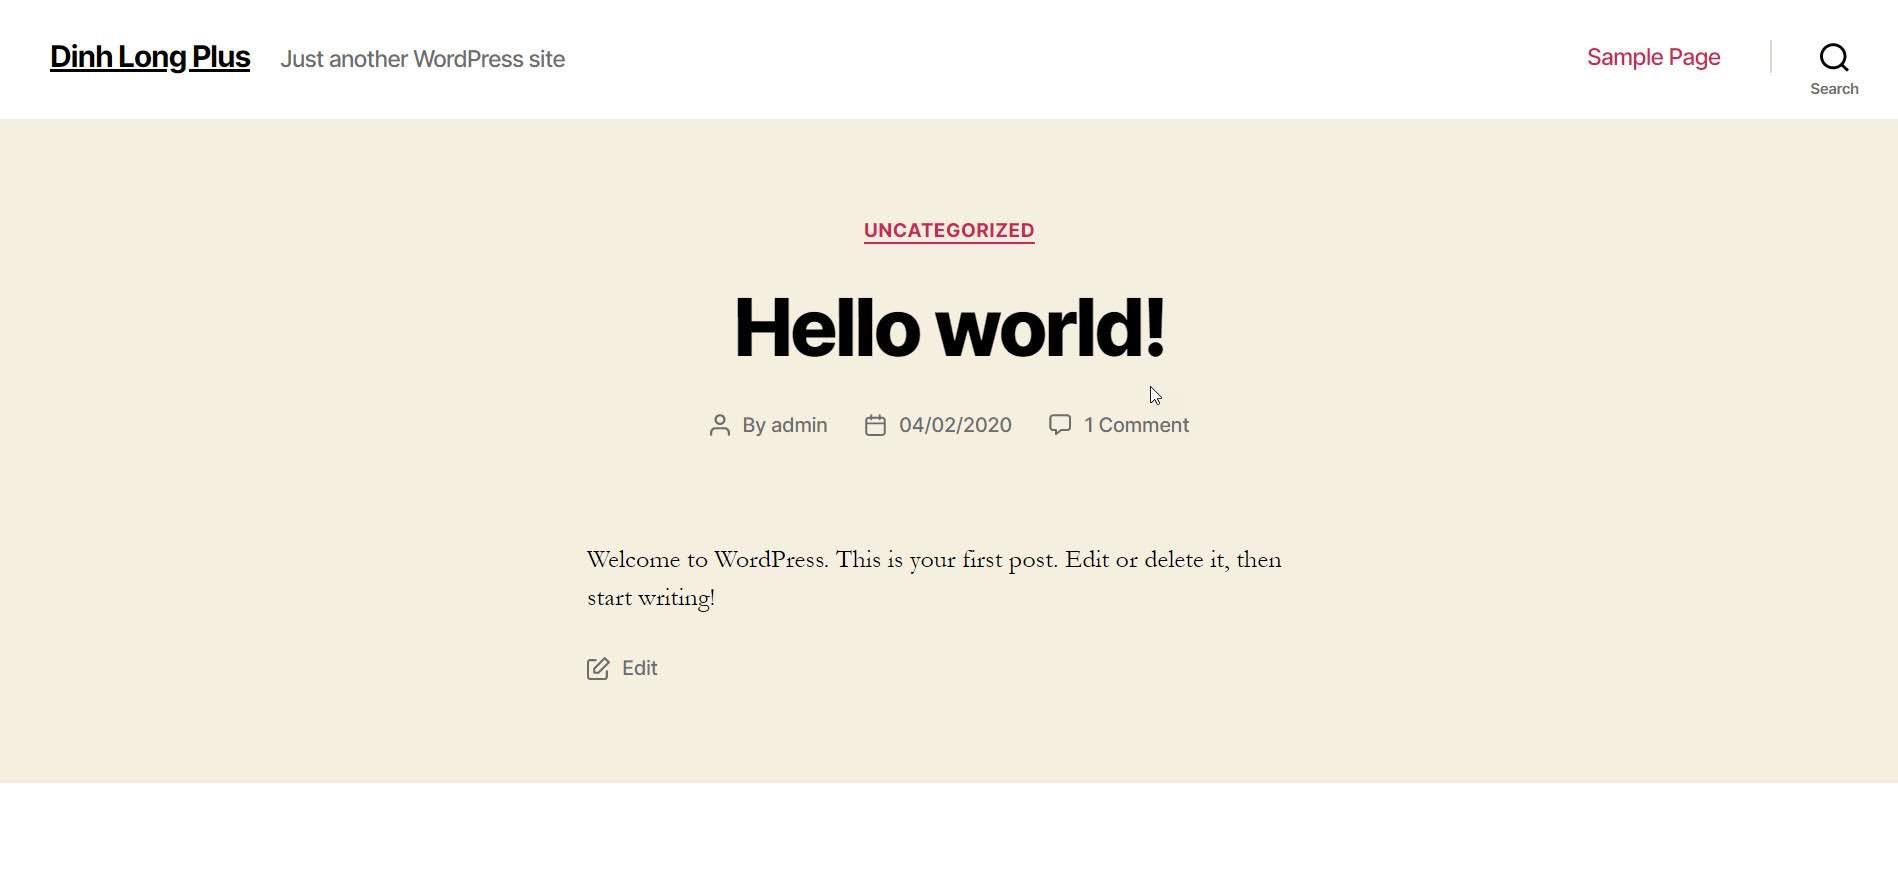 Giao dien (theme) WordPress mac đinh